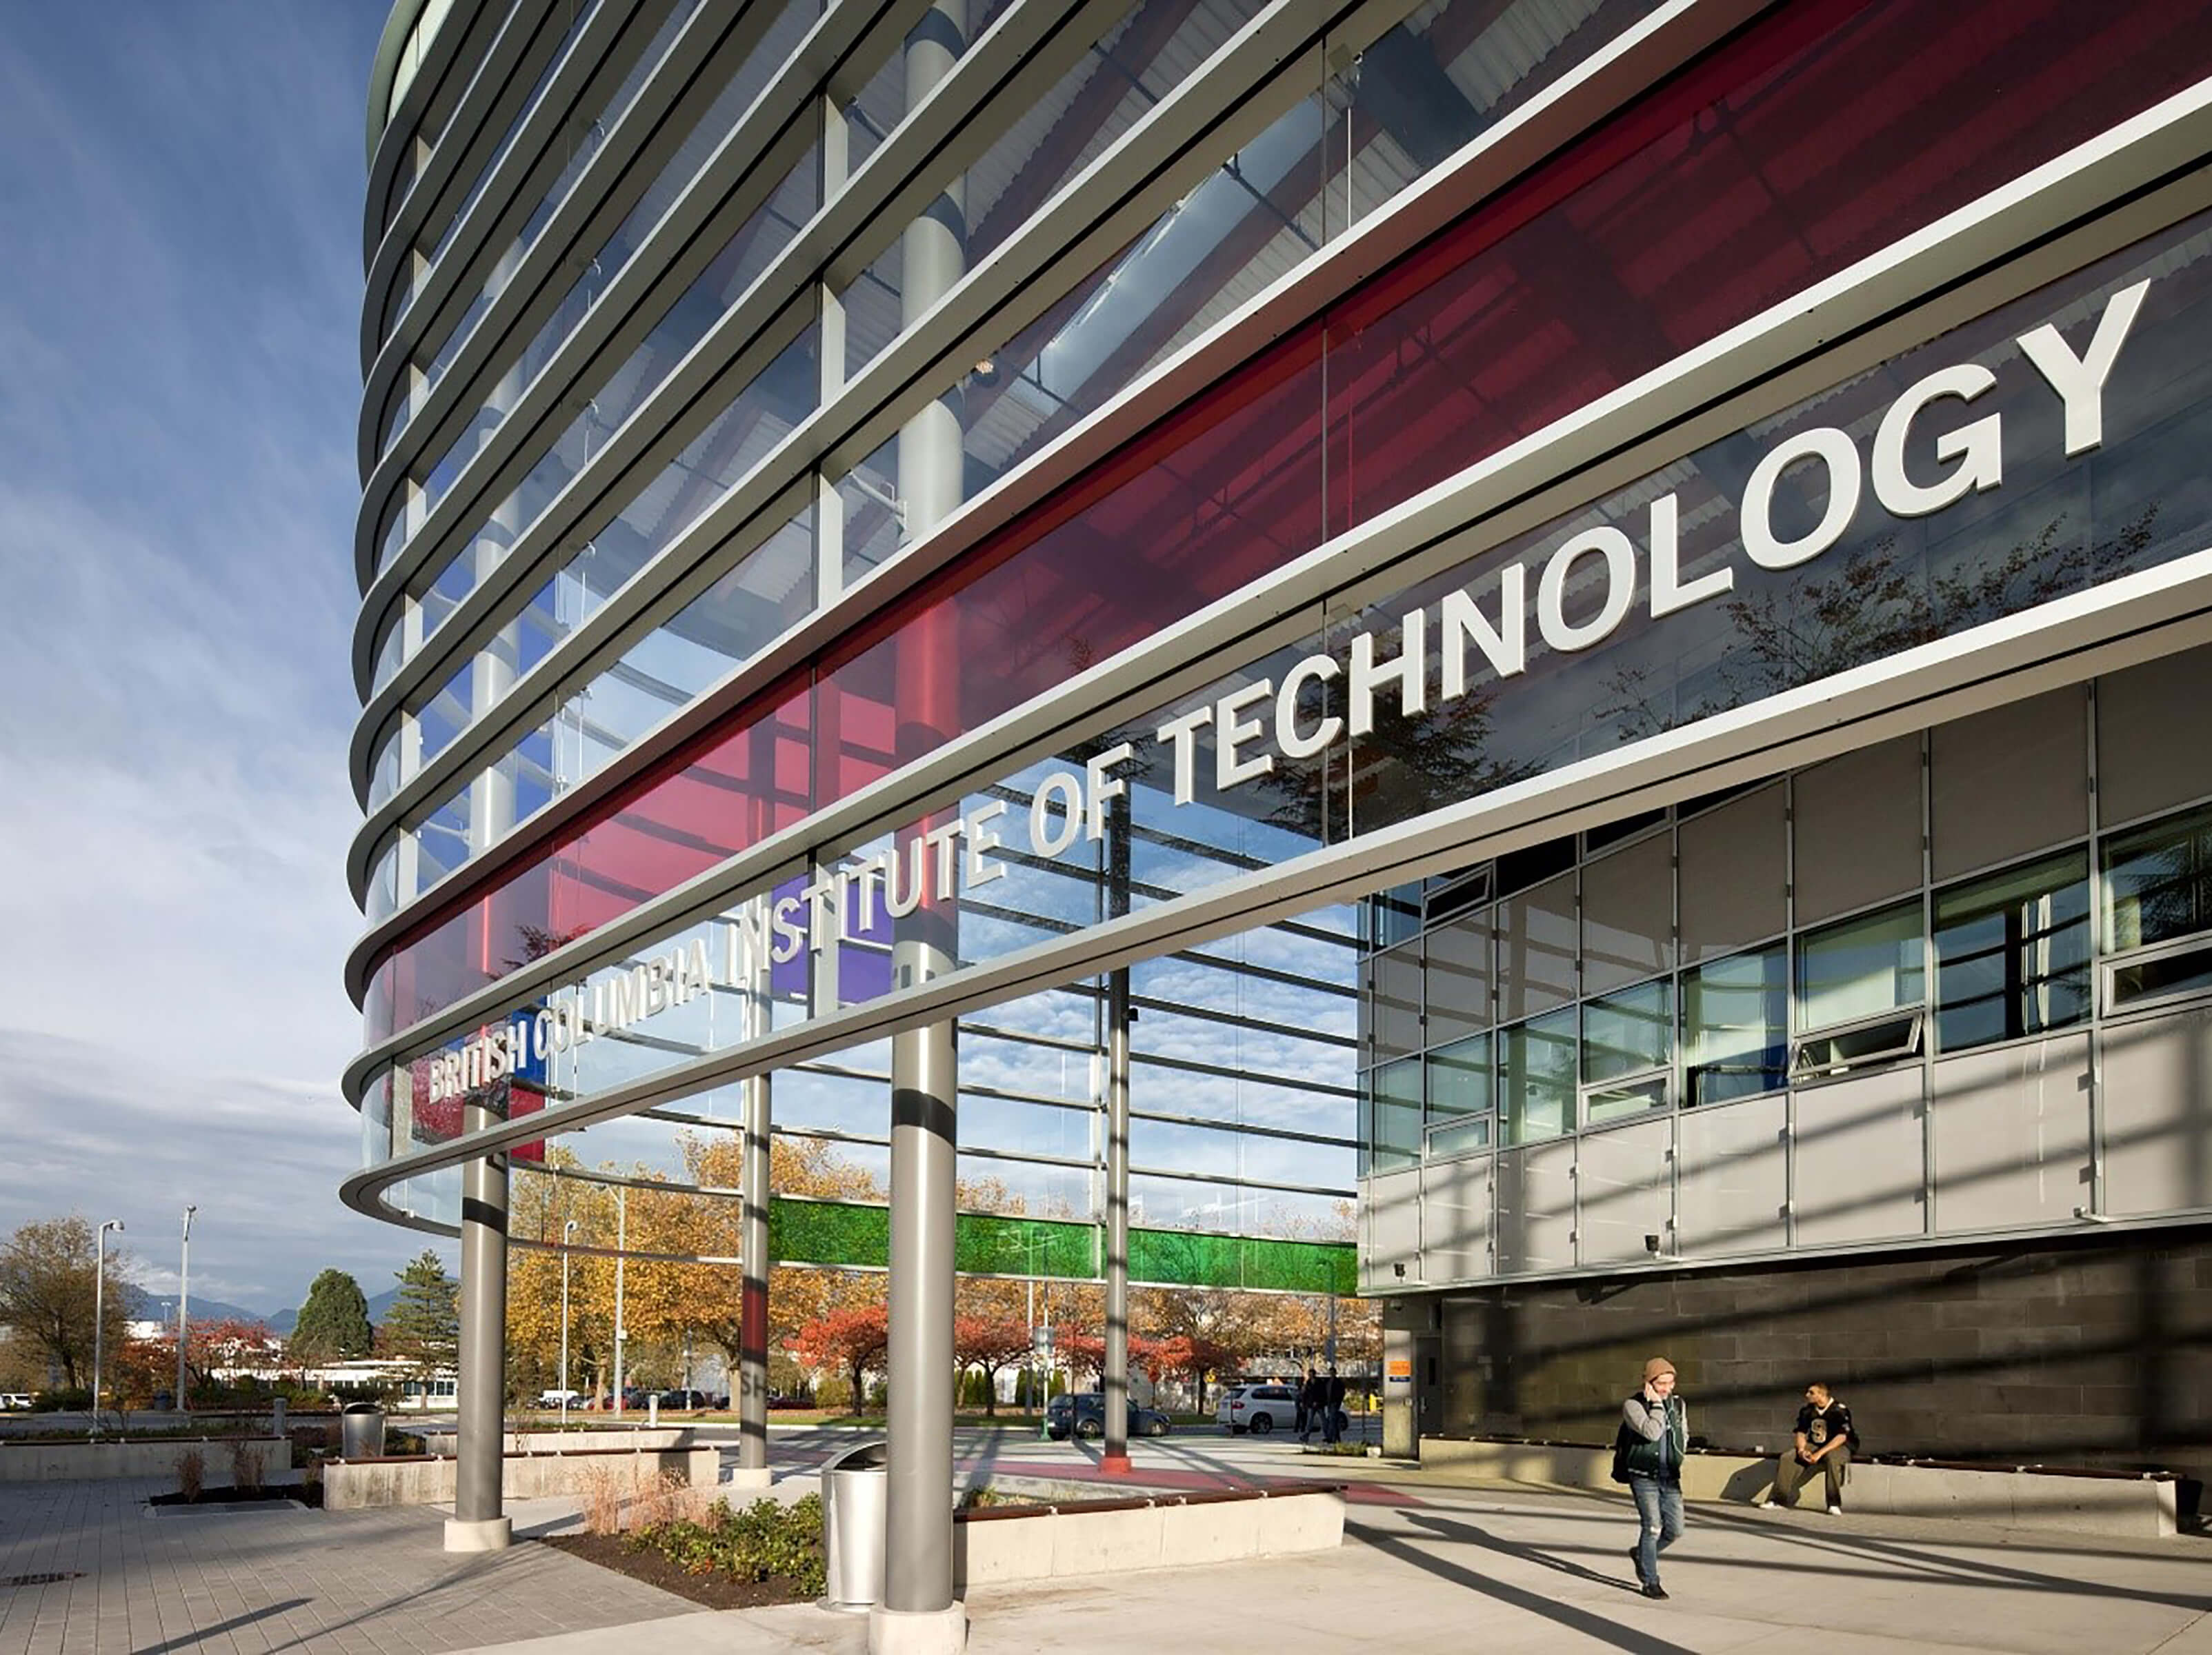 مؤسسه فناوری British Columbia